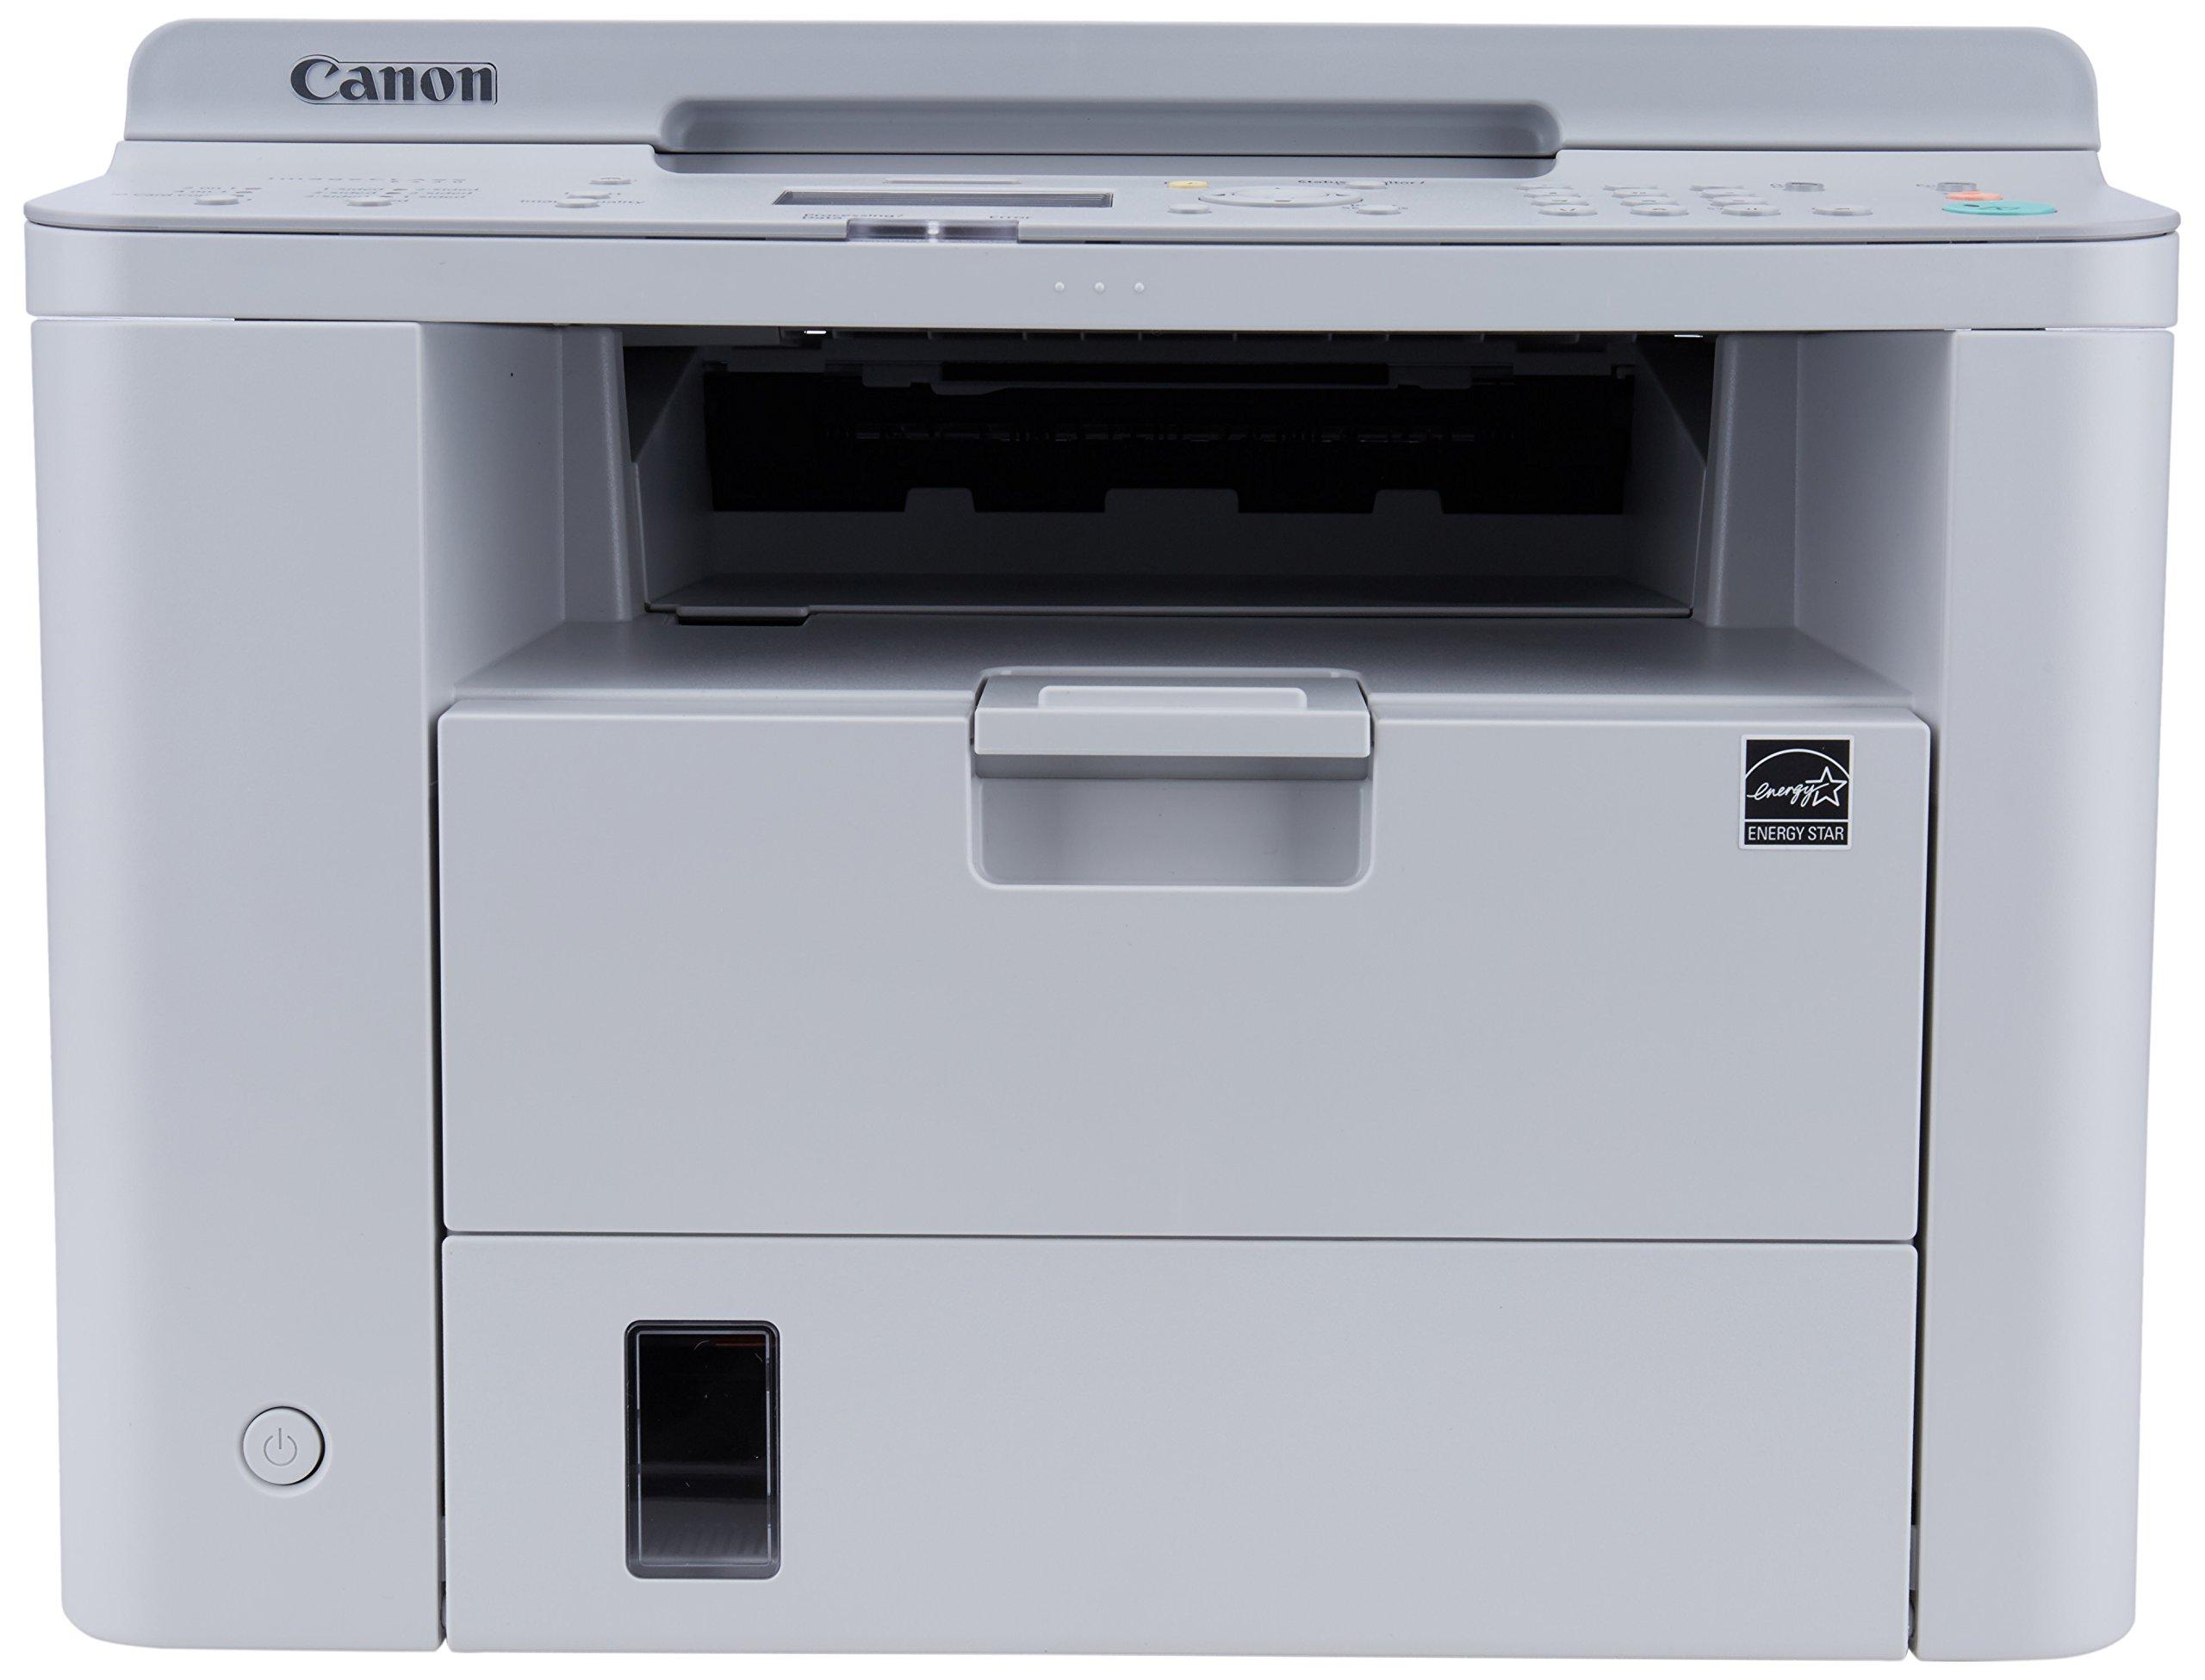 Amazon.com: Canon imageCLASS D530 Monochrome Laser Printer with Scanner and  Copier: Electronics